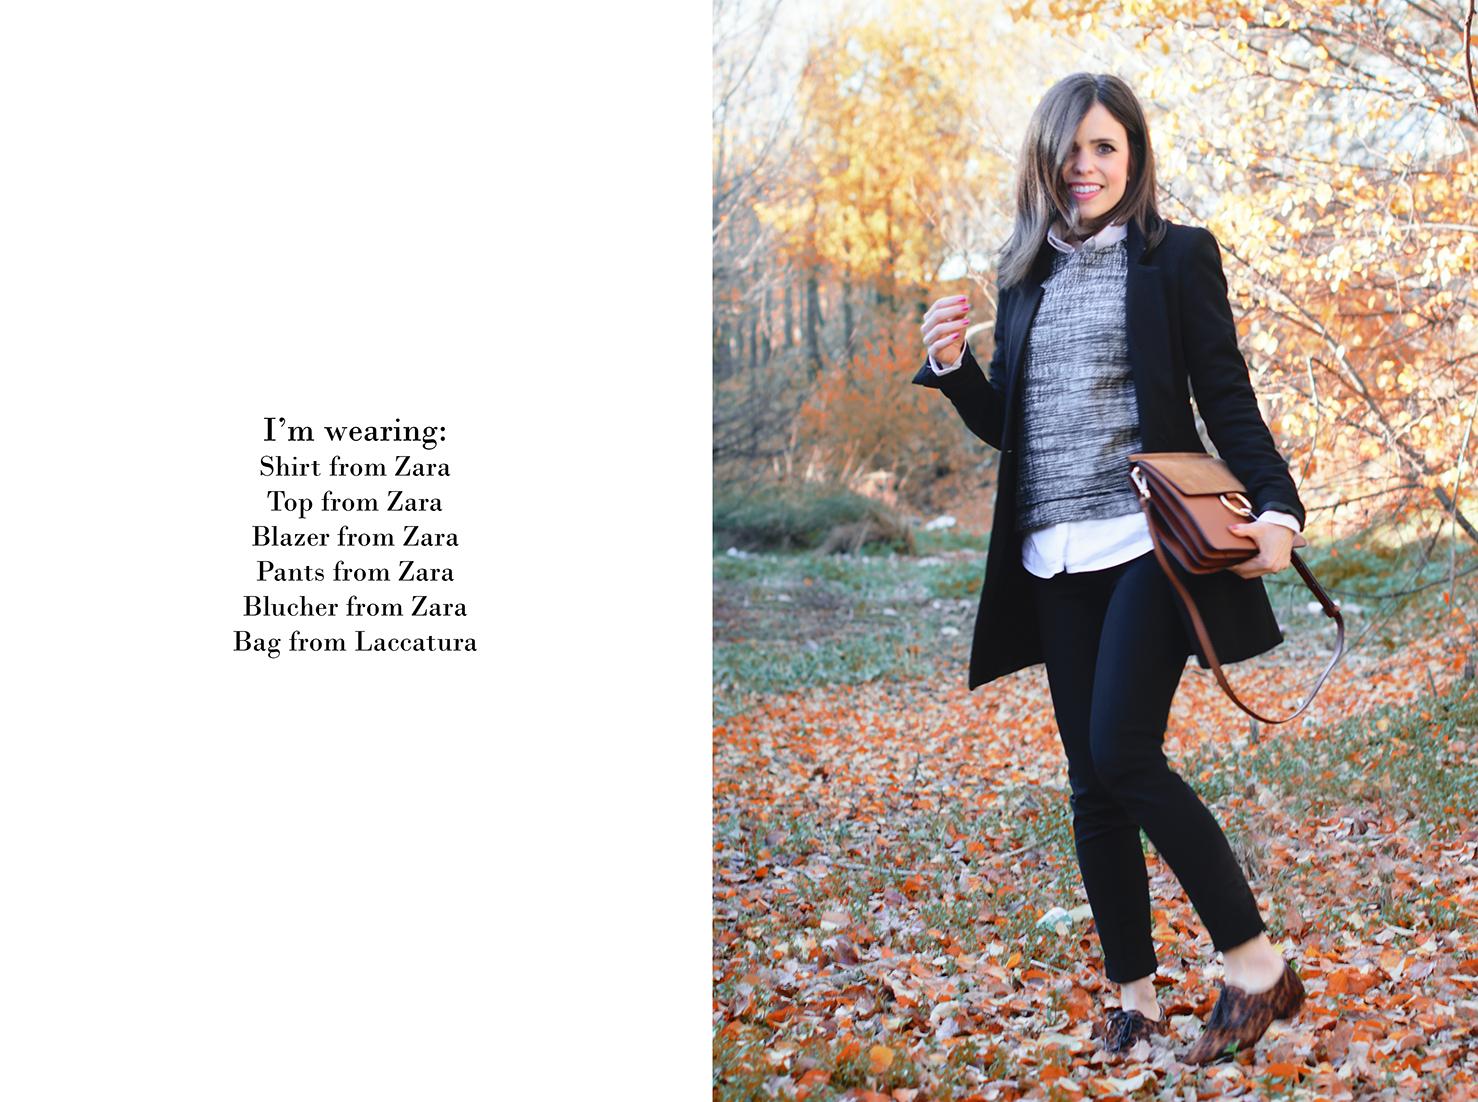 Look de estilo working de Zara con bolso inspiración chloe